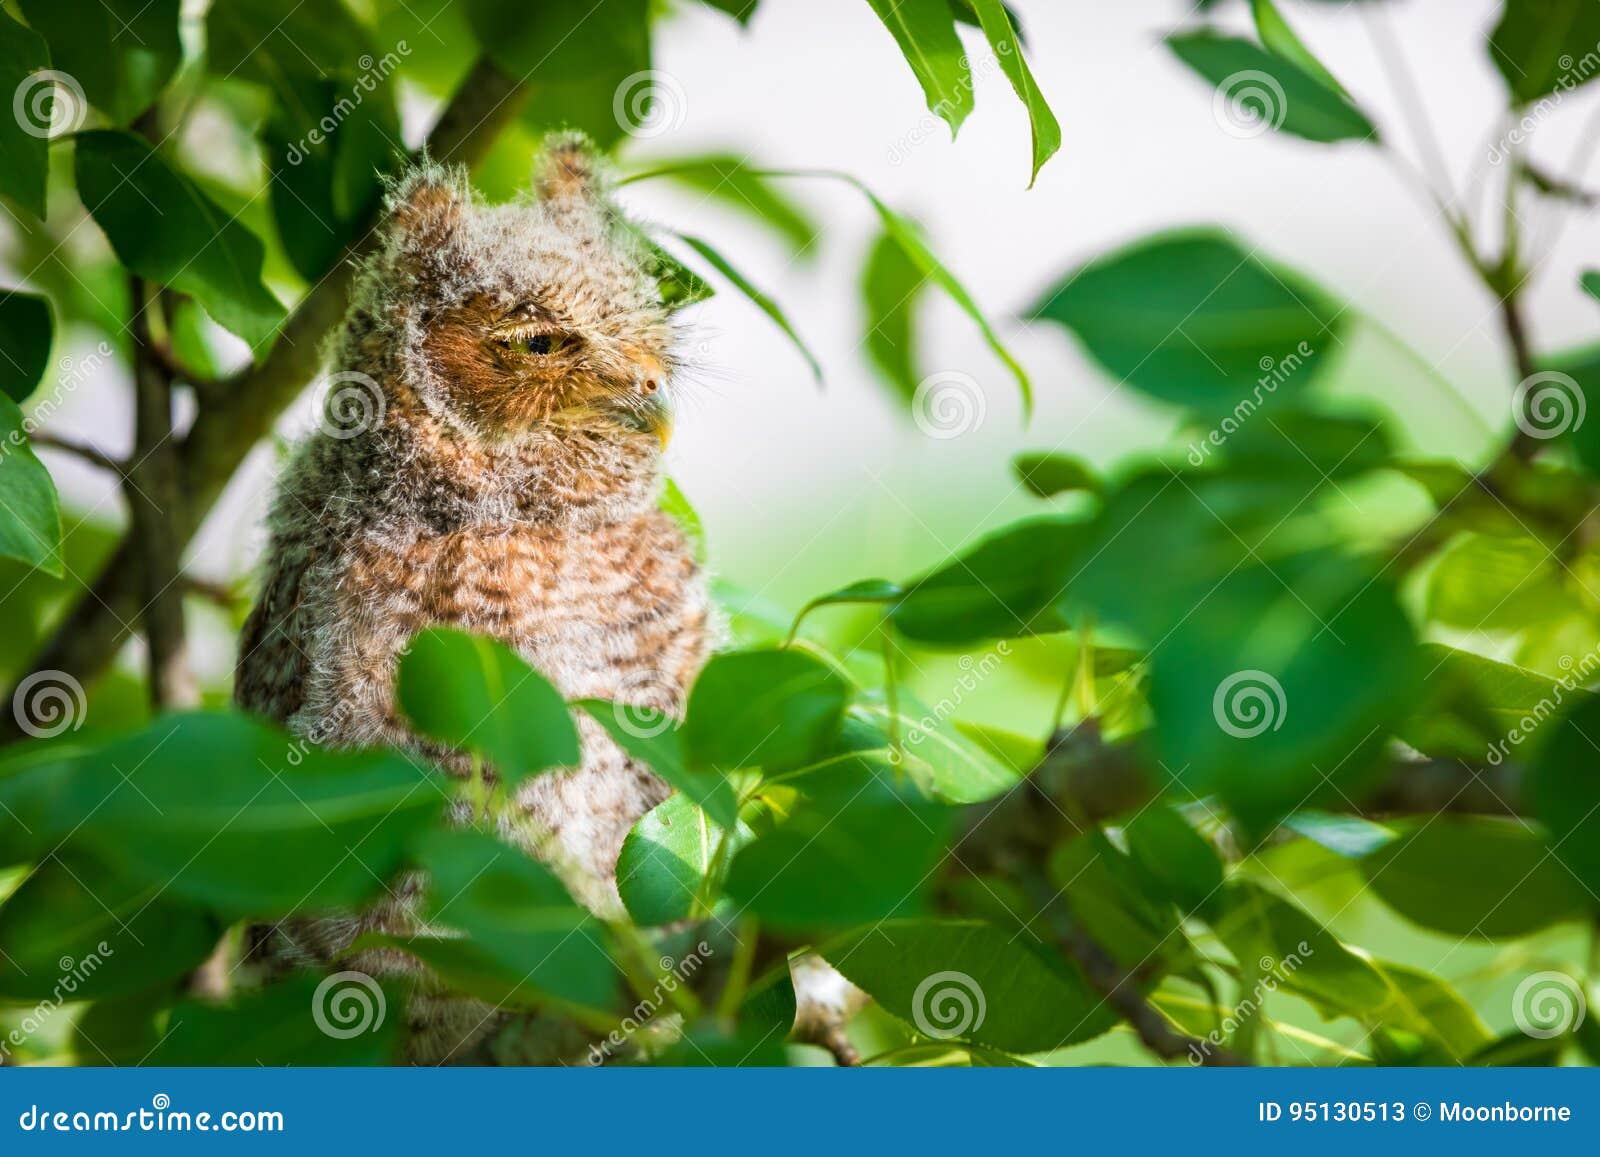 Chillido Owl Looking Away